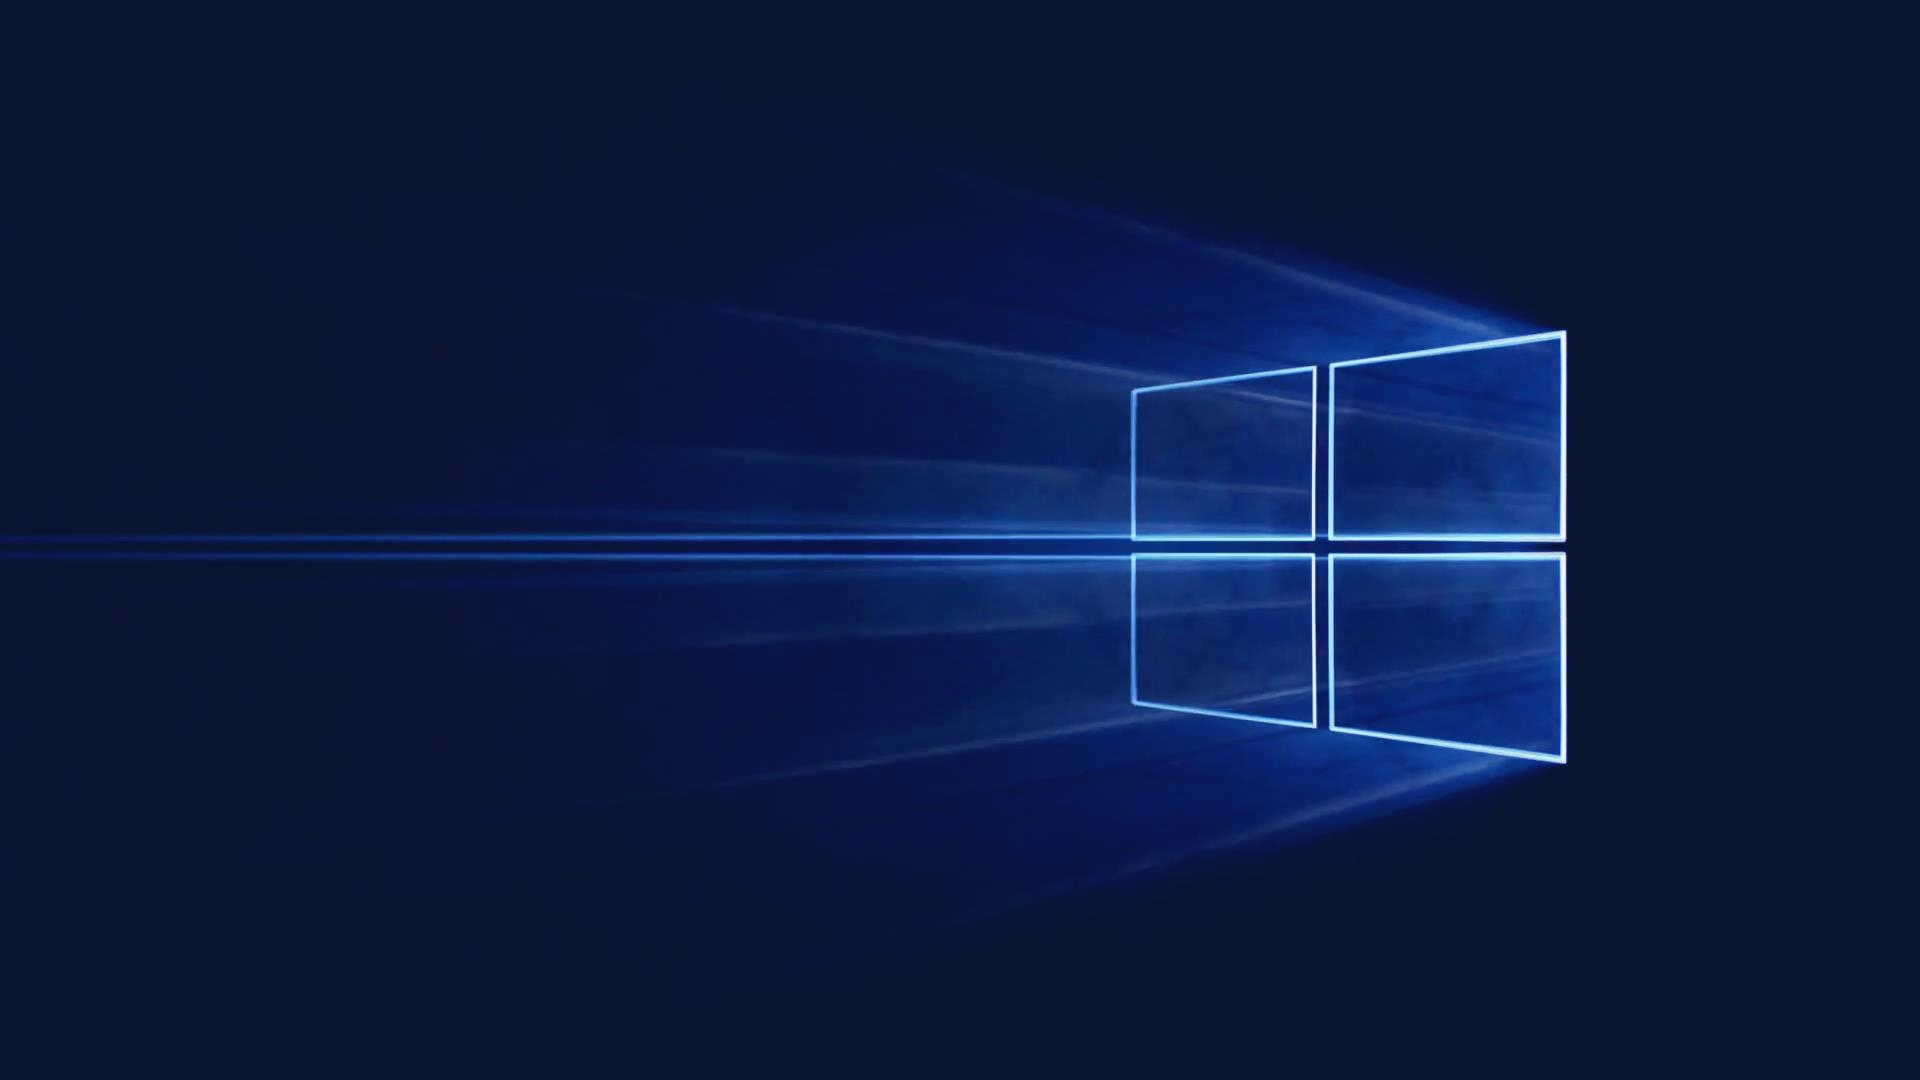 windows logo icone